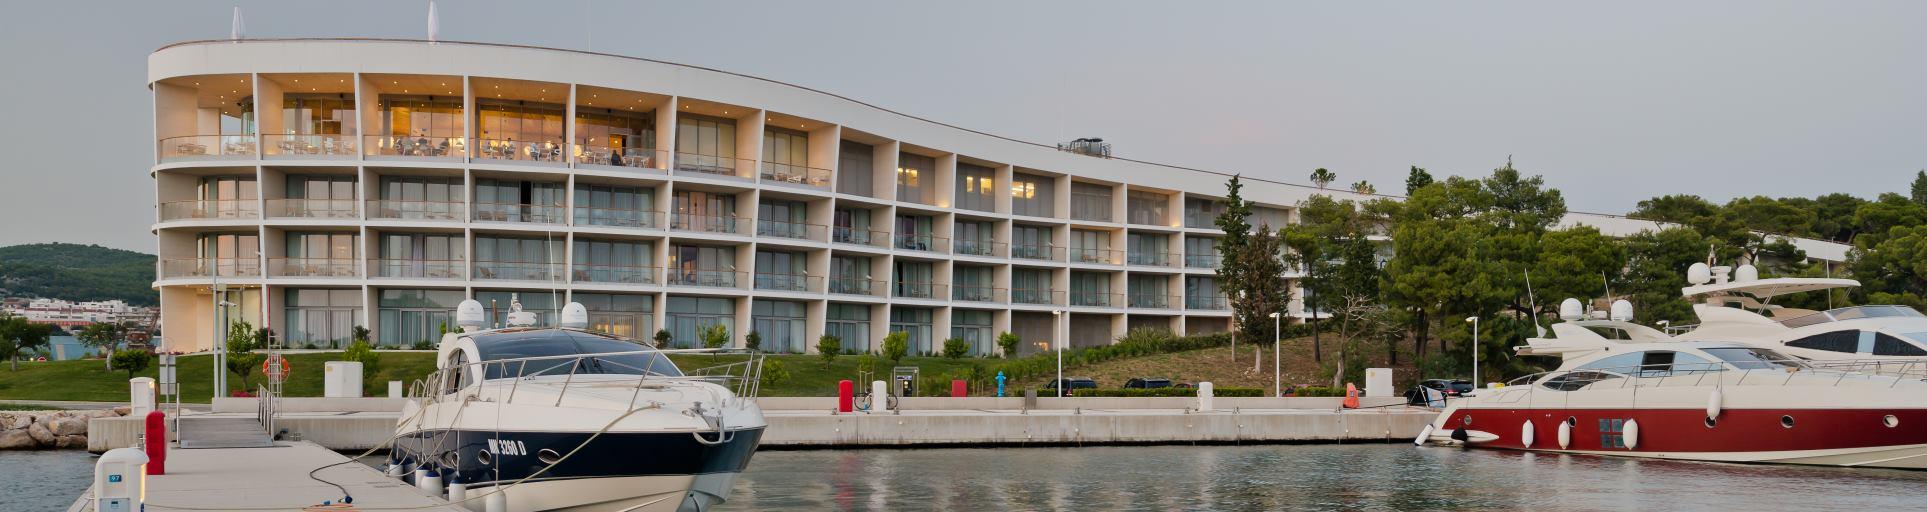 Hotel-D-Resort-Mandalina-sibenik